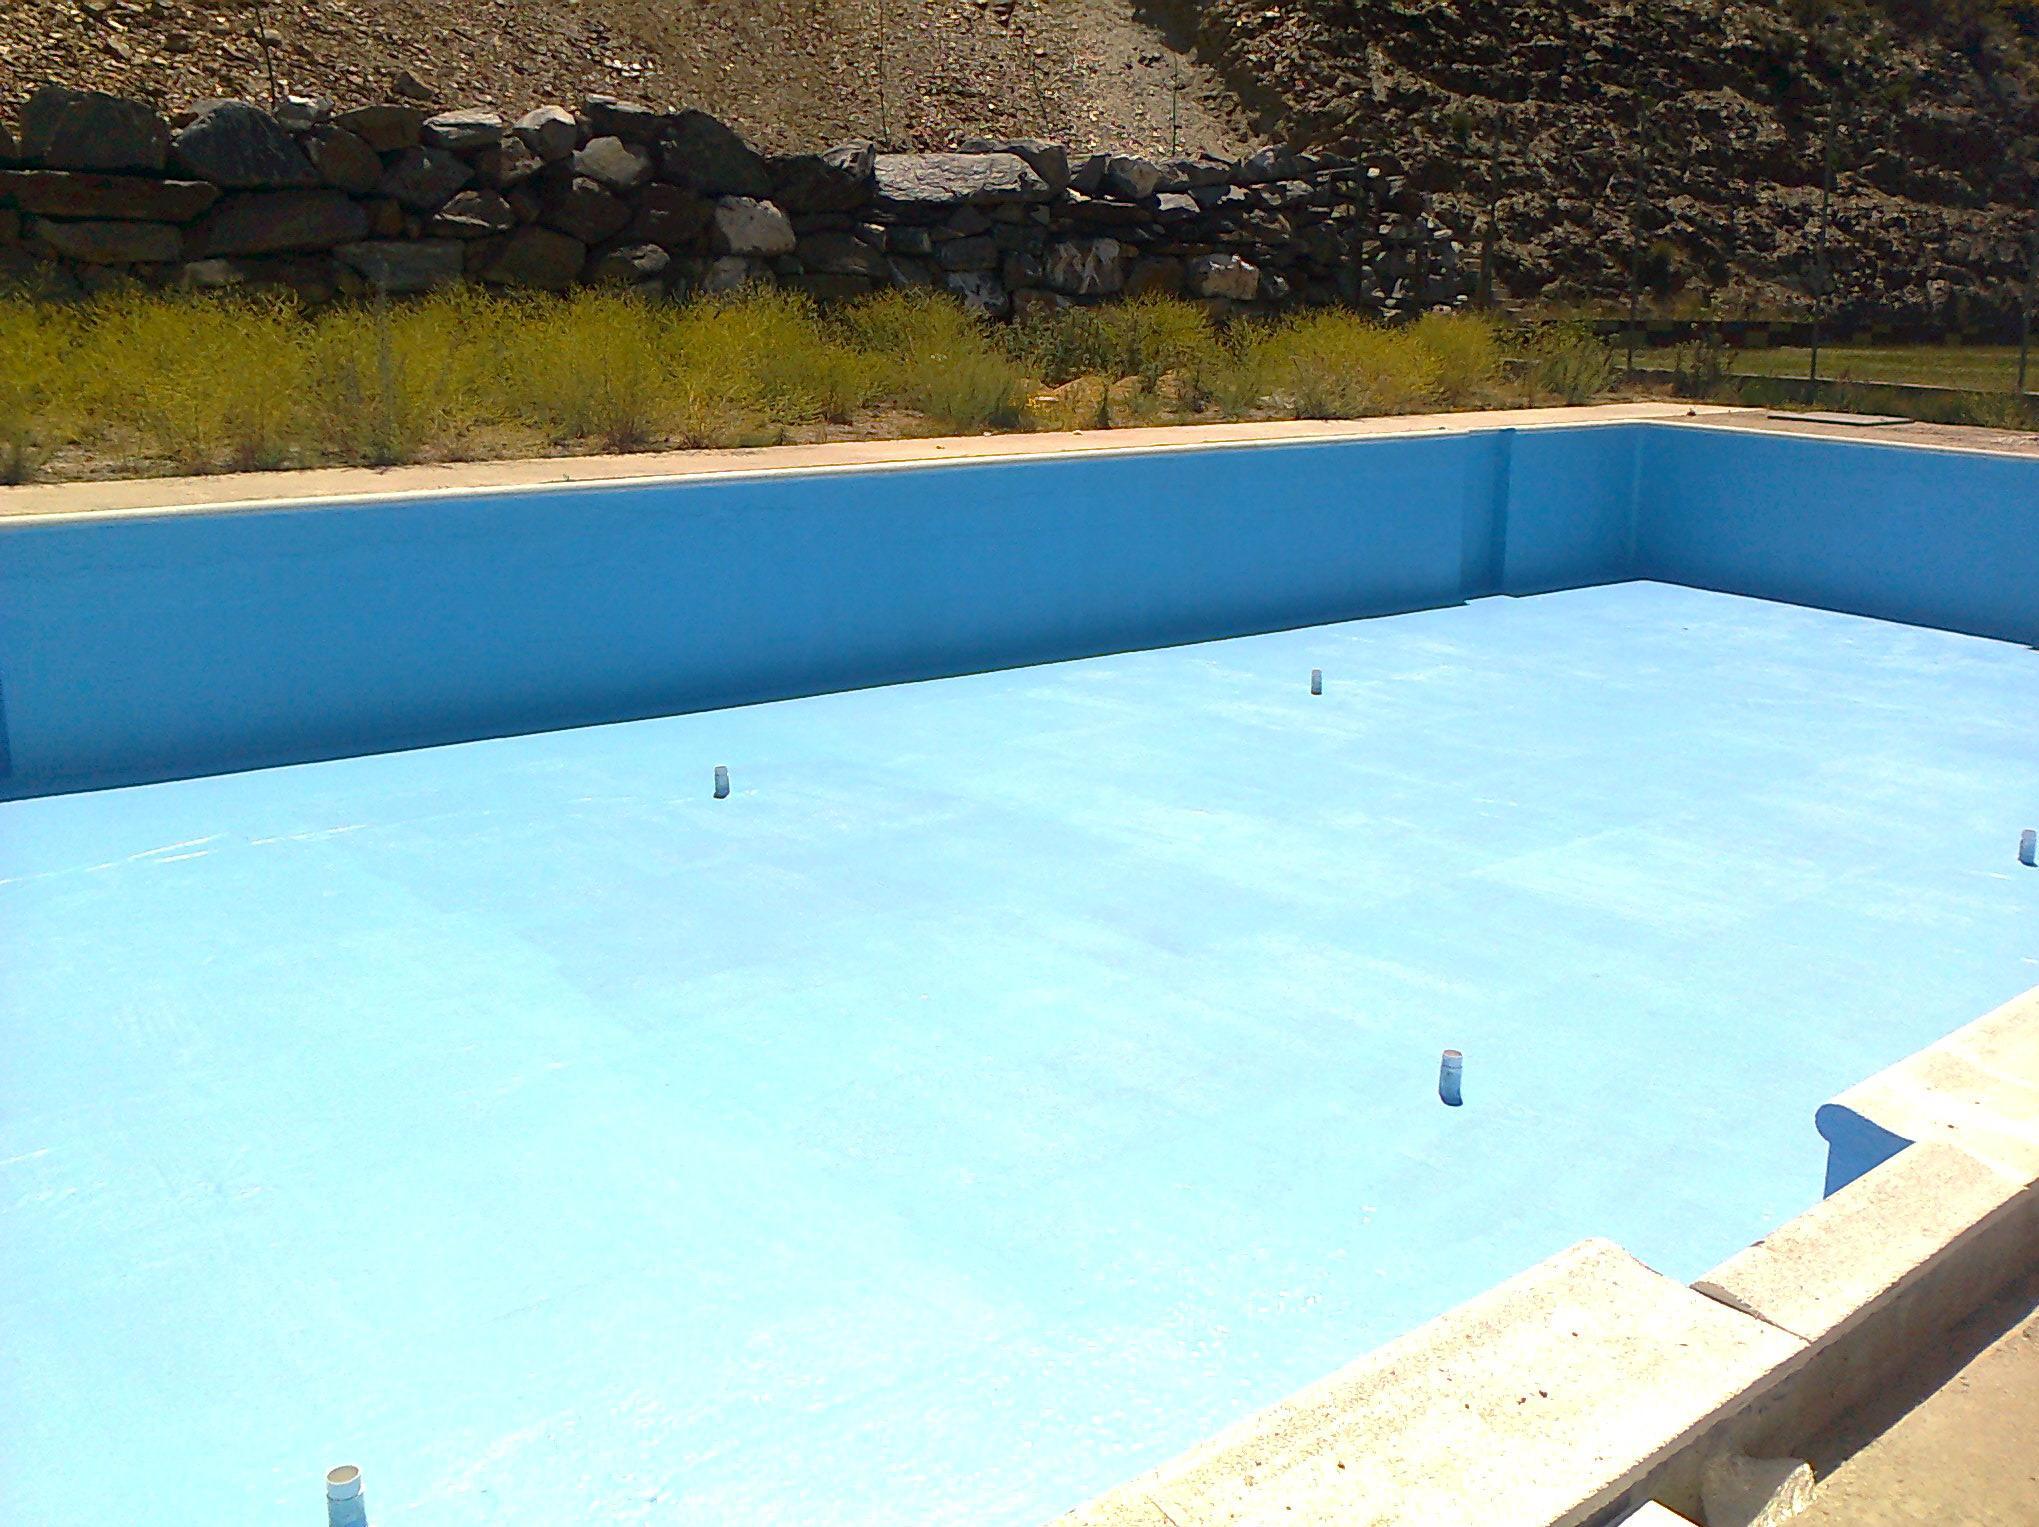 Impermeabilizacion de piscina mediante laminado de poliester